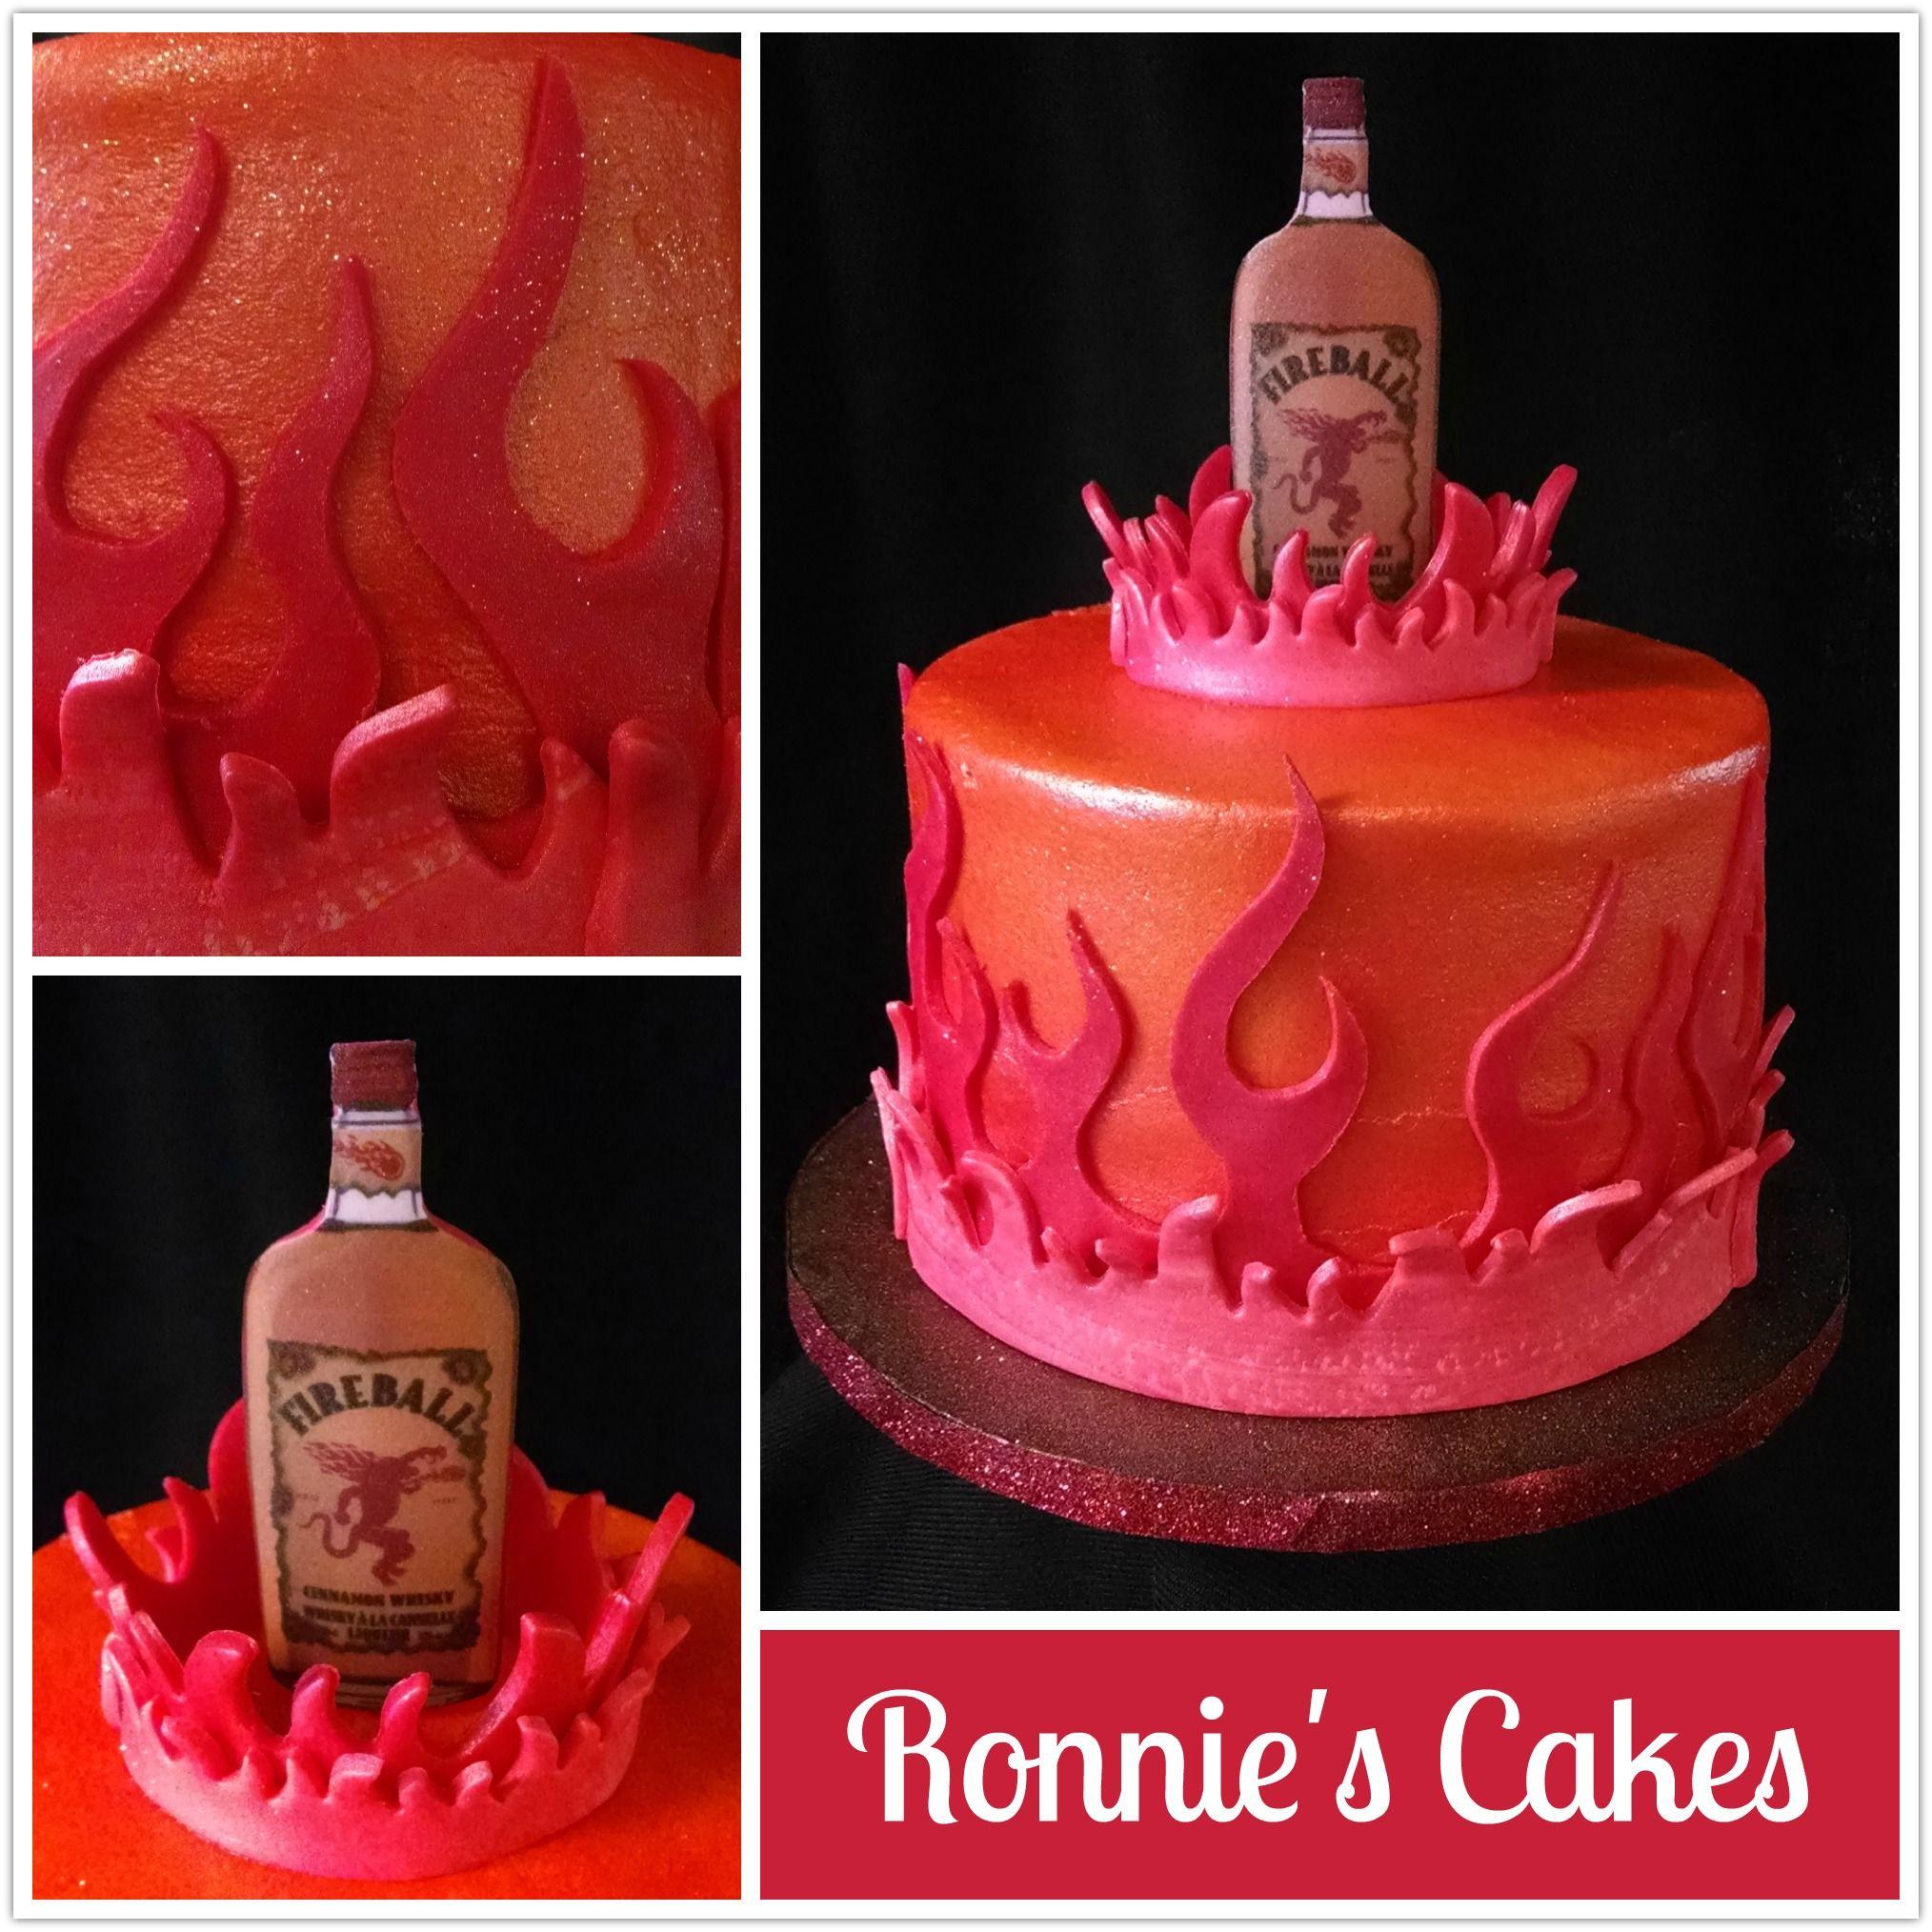 Birthday cake for someone who loves fireball whisky